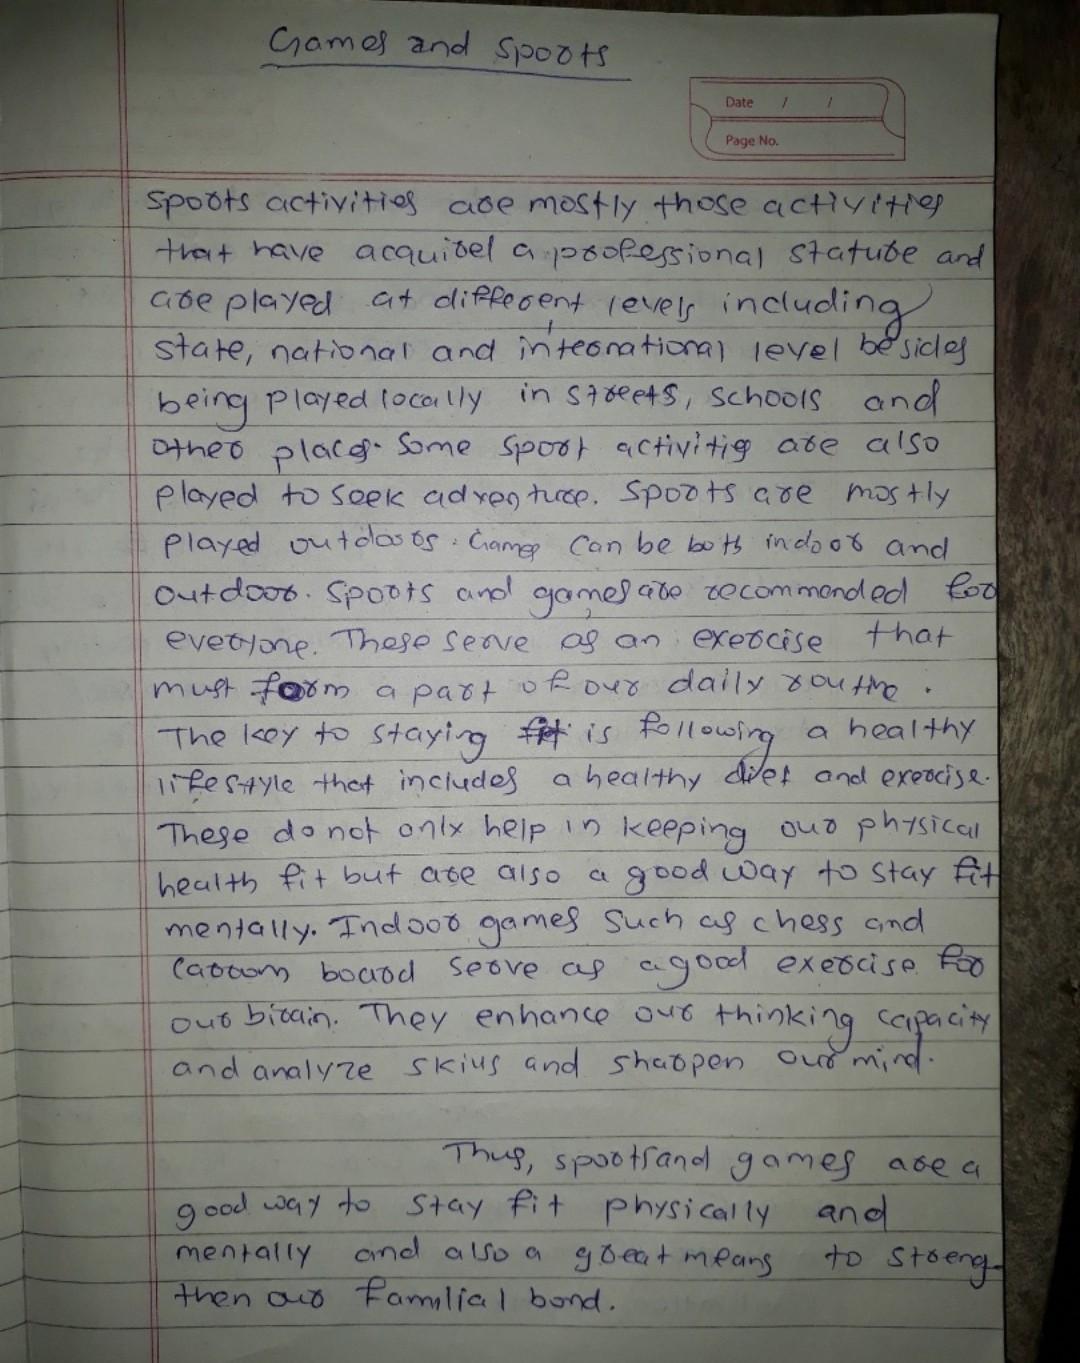 A paragraph on good sportsmanship     (100-150 words